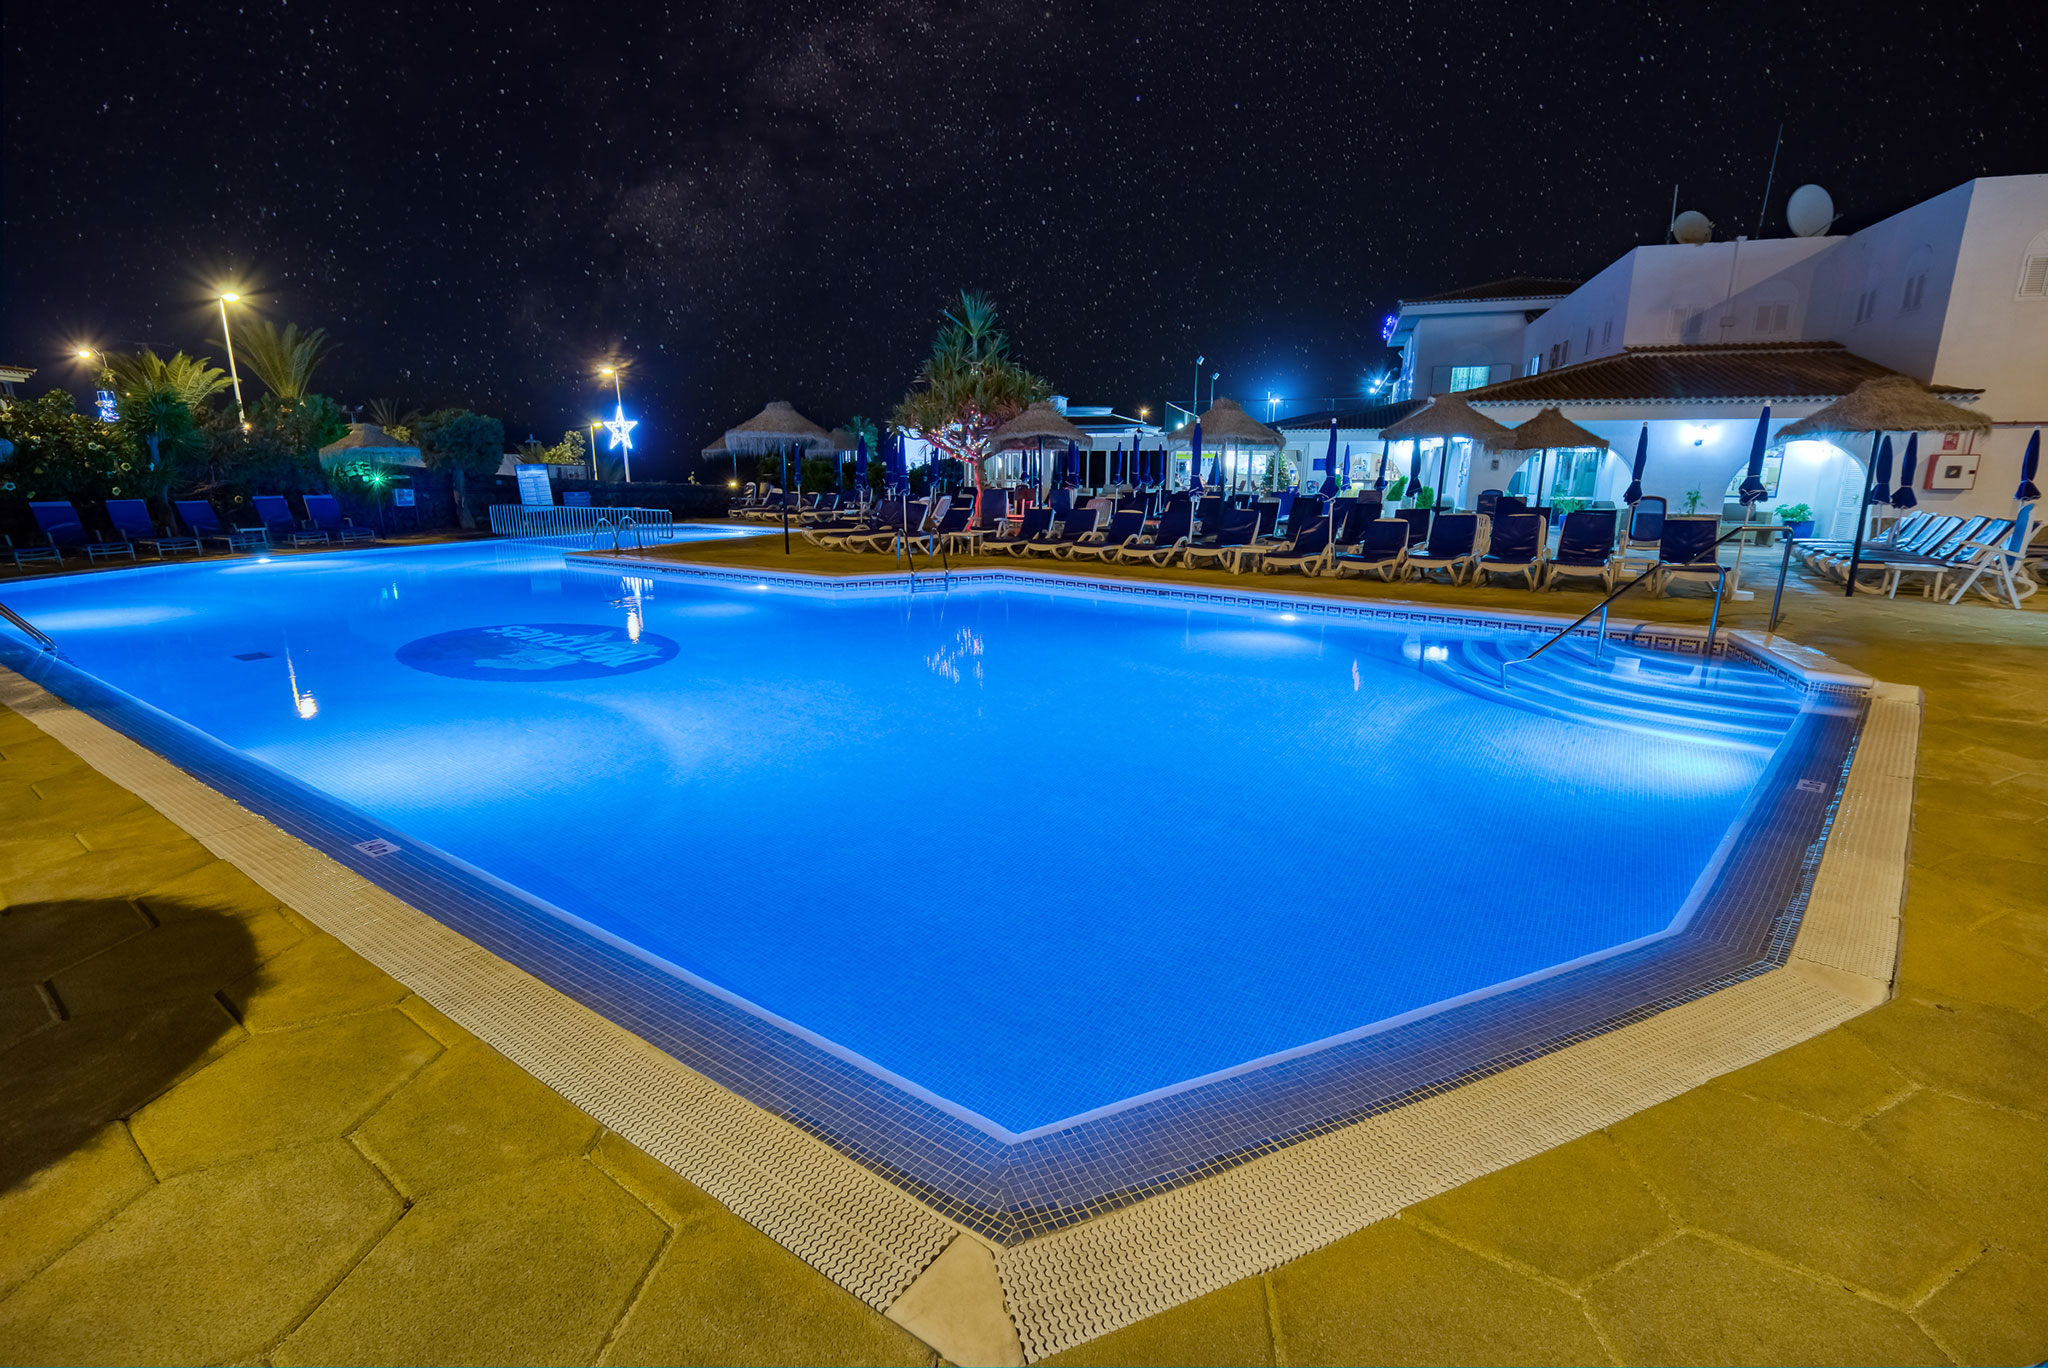 hotel-marques-pool-area-night